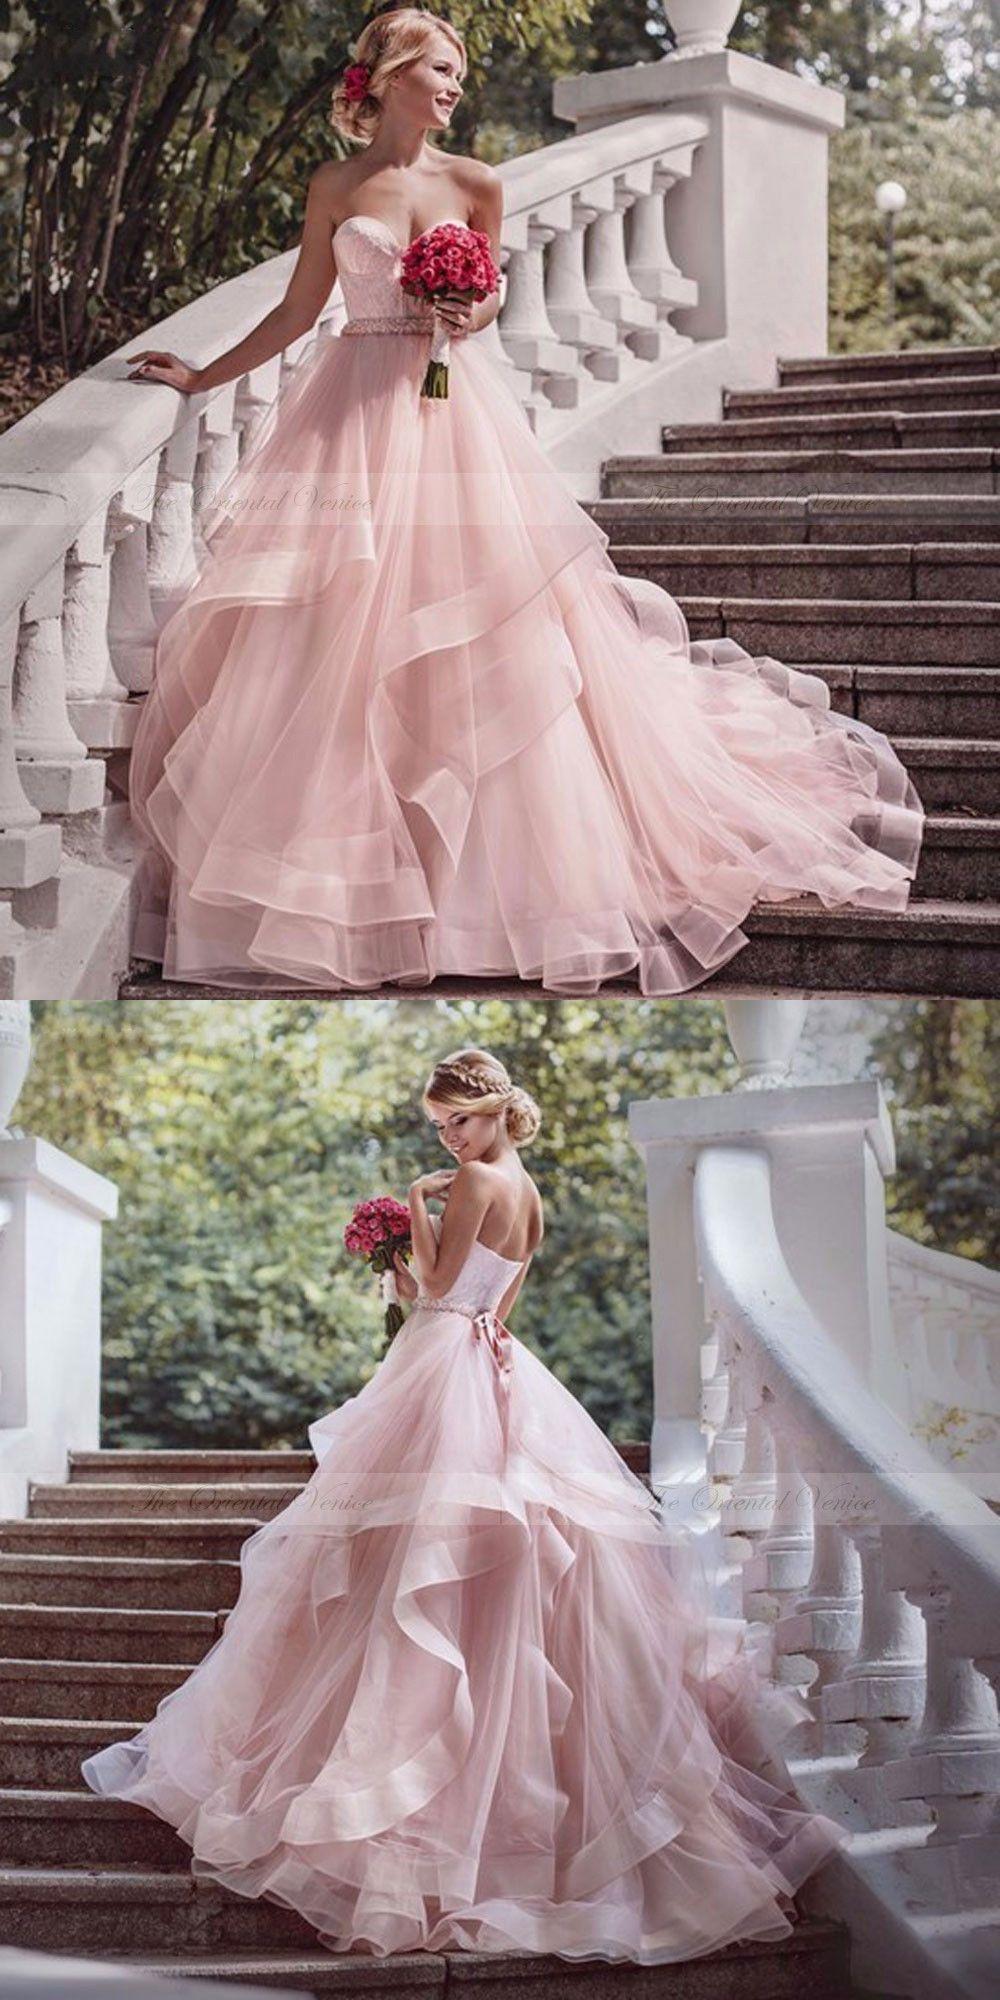 8f1ad2f5319ade224d915b0d9525d470 - 15 schöne rosa Brautkleider